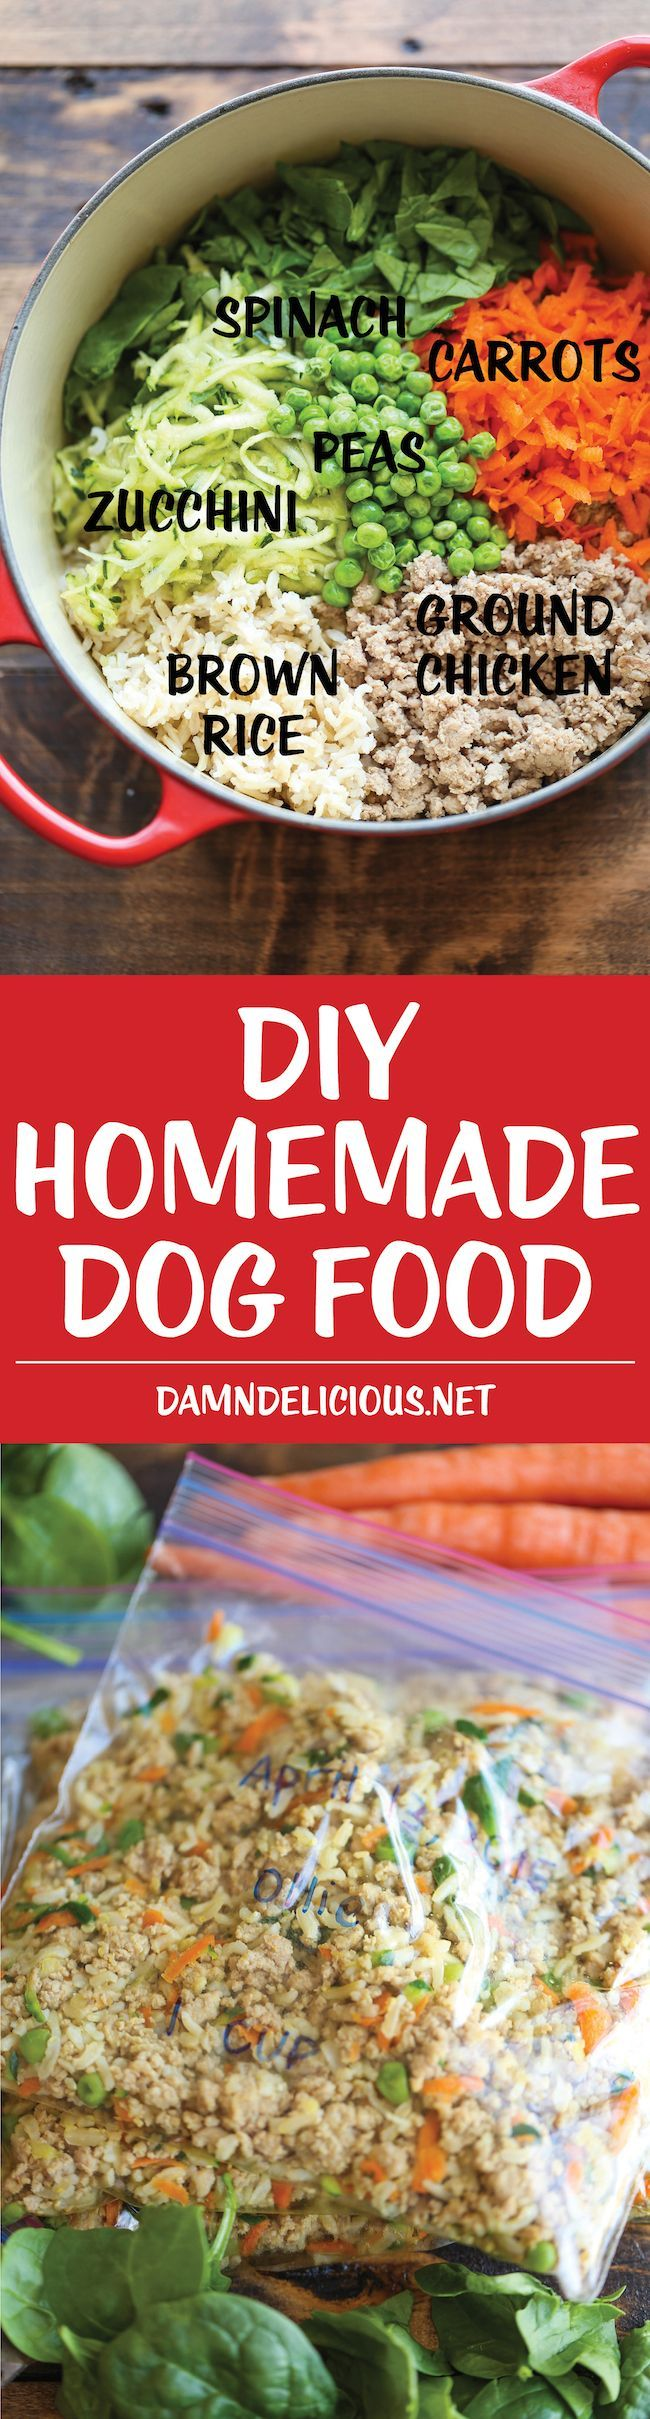 11 best dog food recipes images on pinterest dog food recipes dog diy homemade dog food forumfinder Gallery